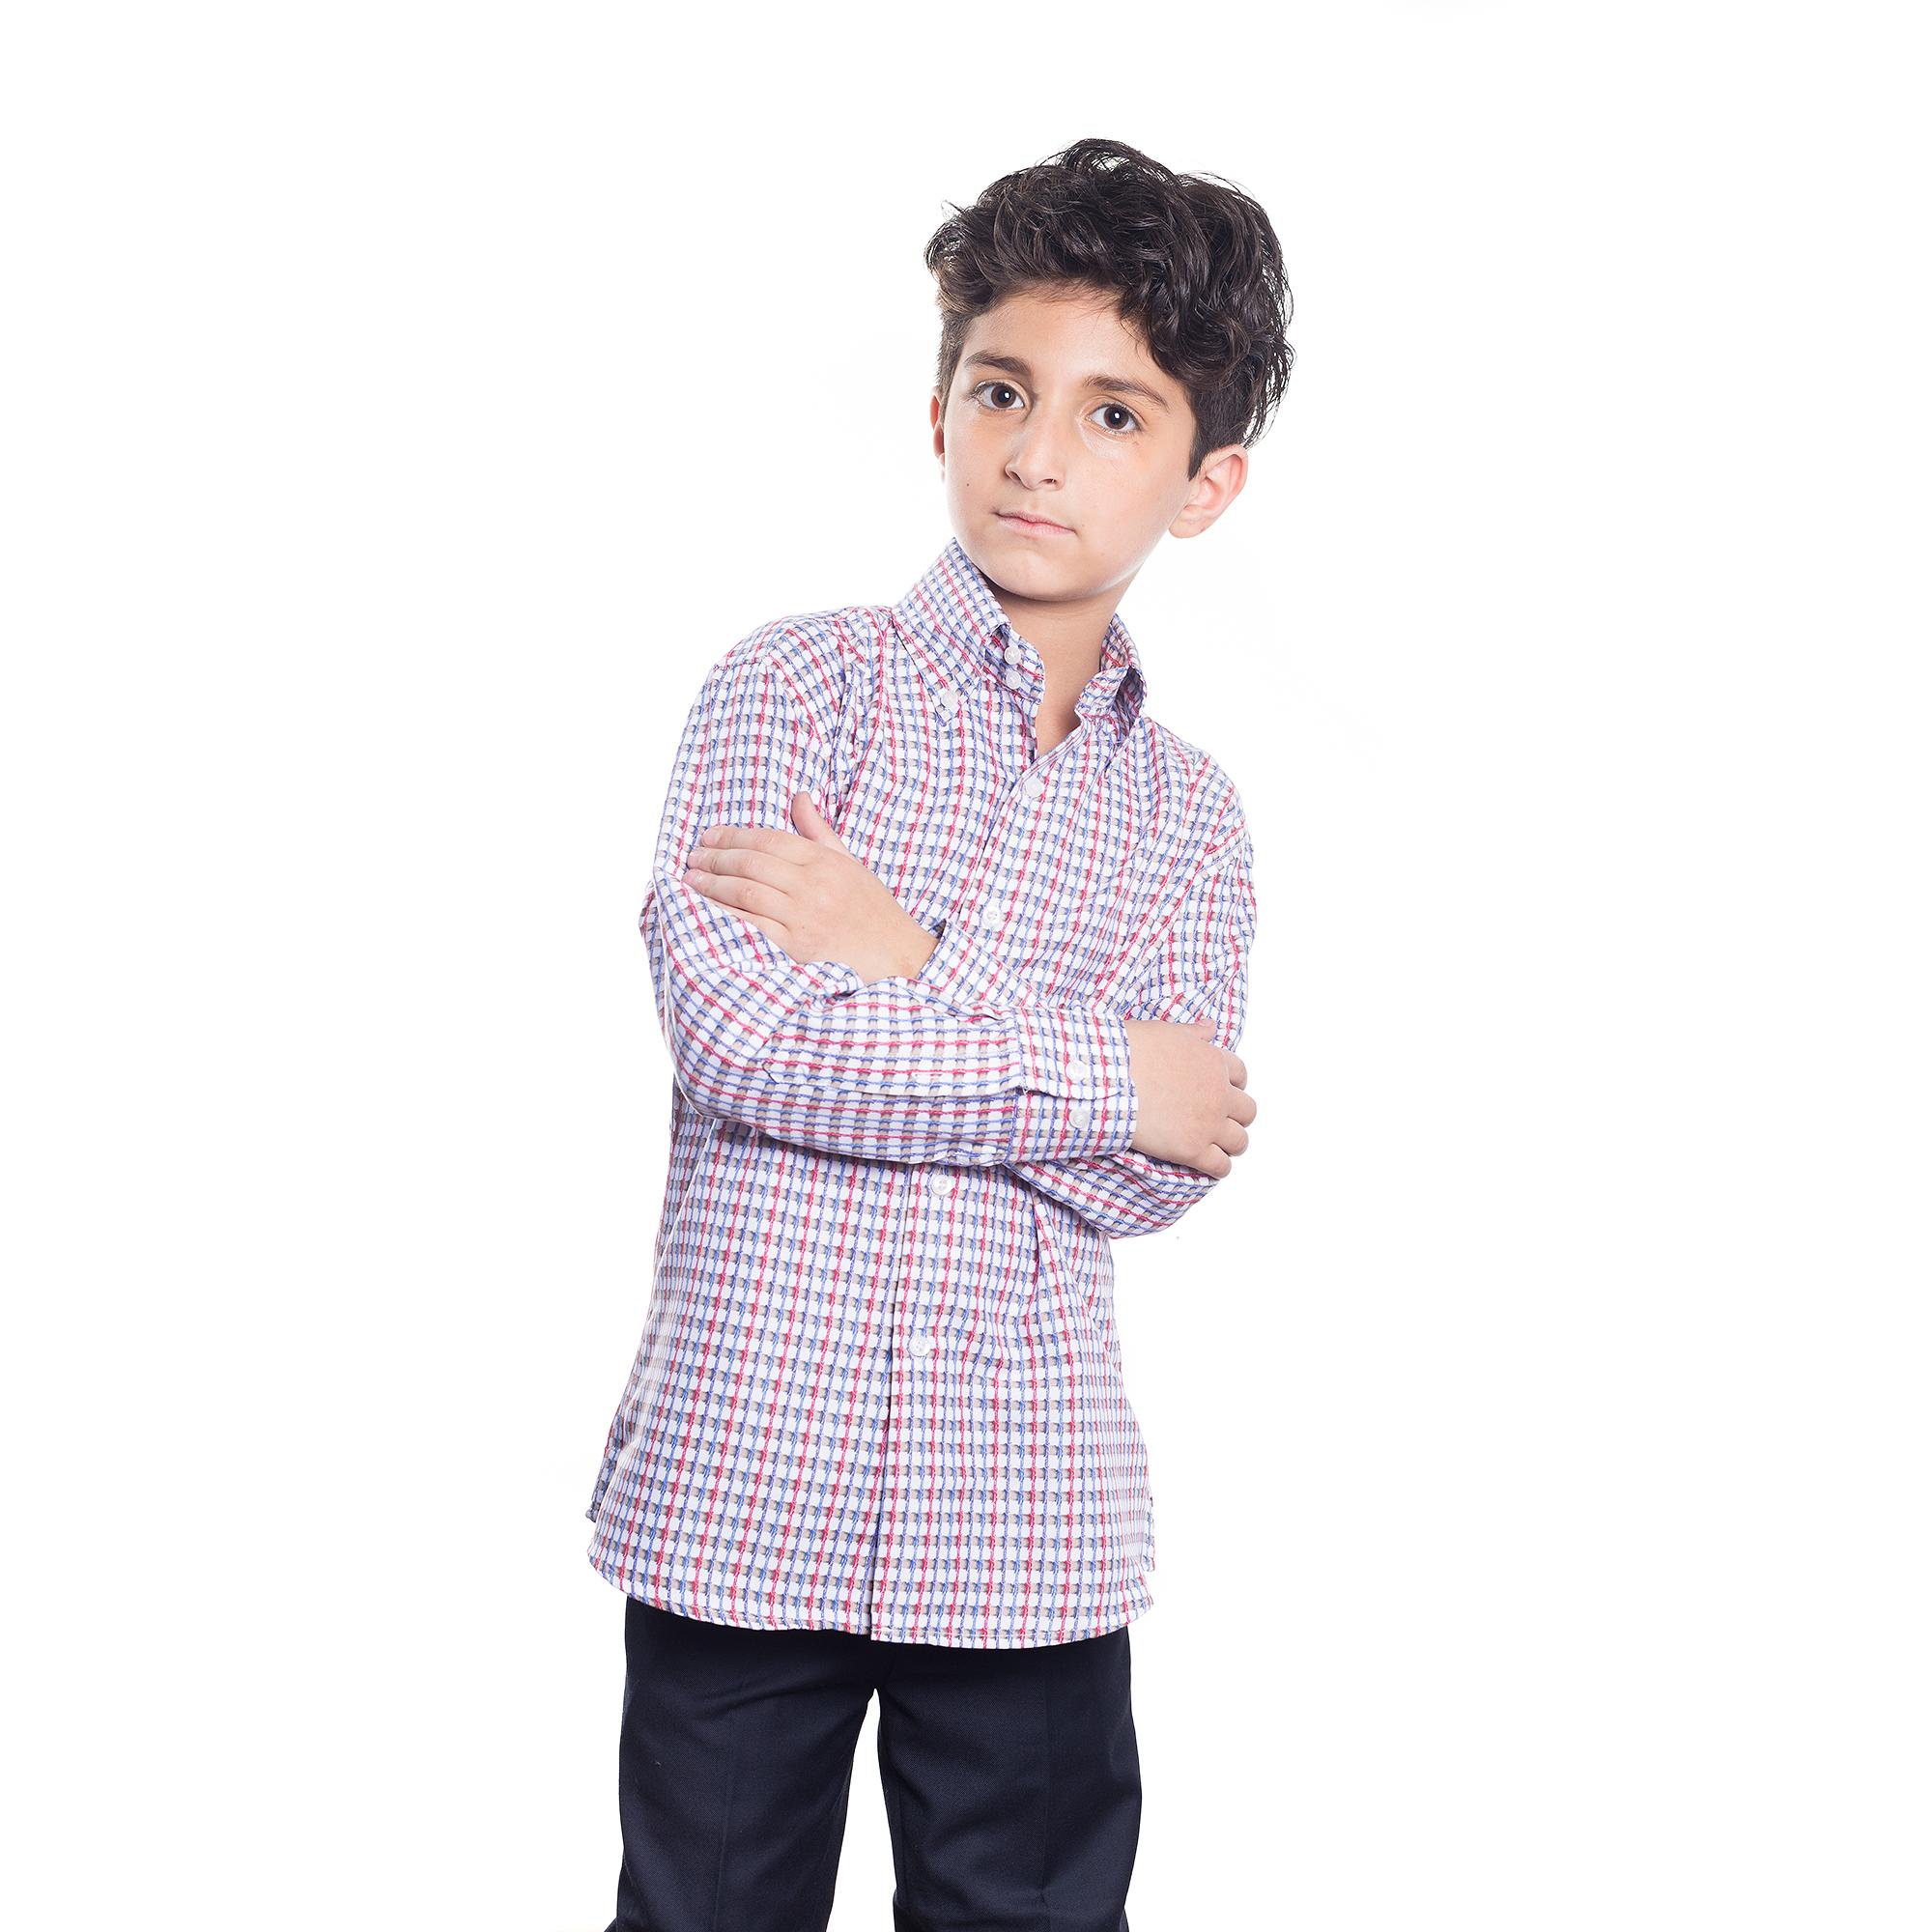 3D Print Design Boys Shirts / Button Down EBSH142B